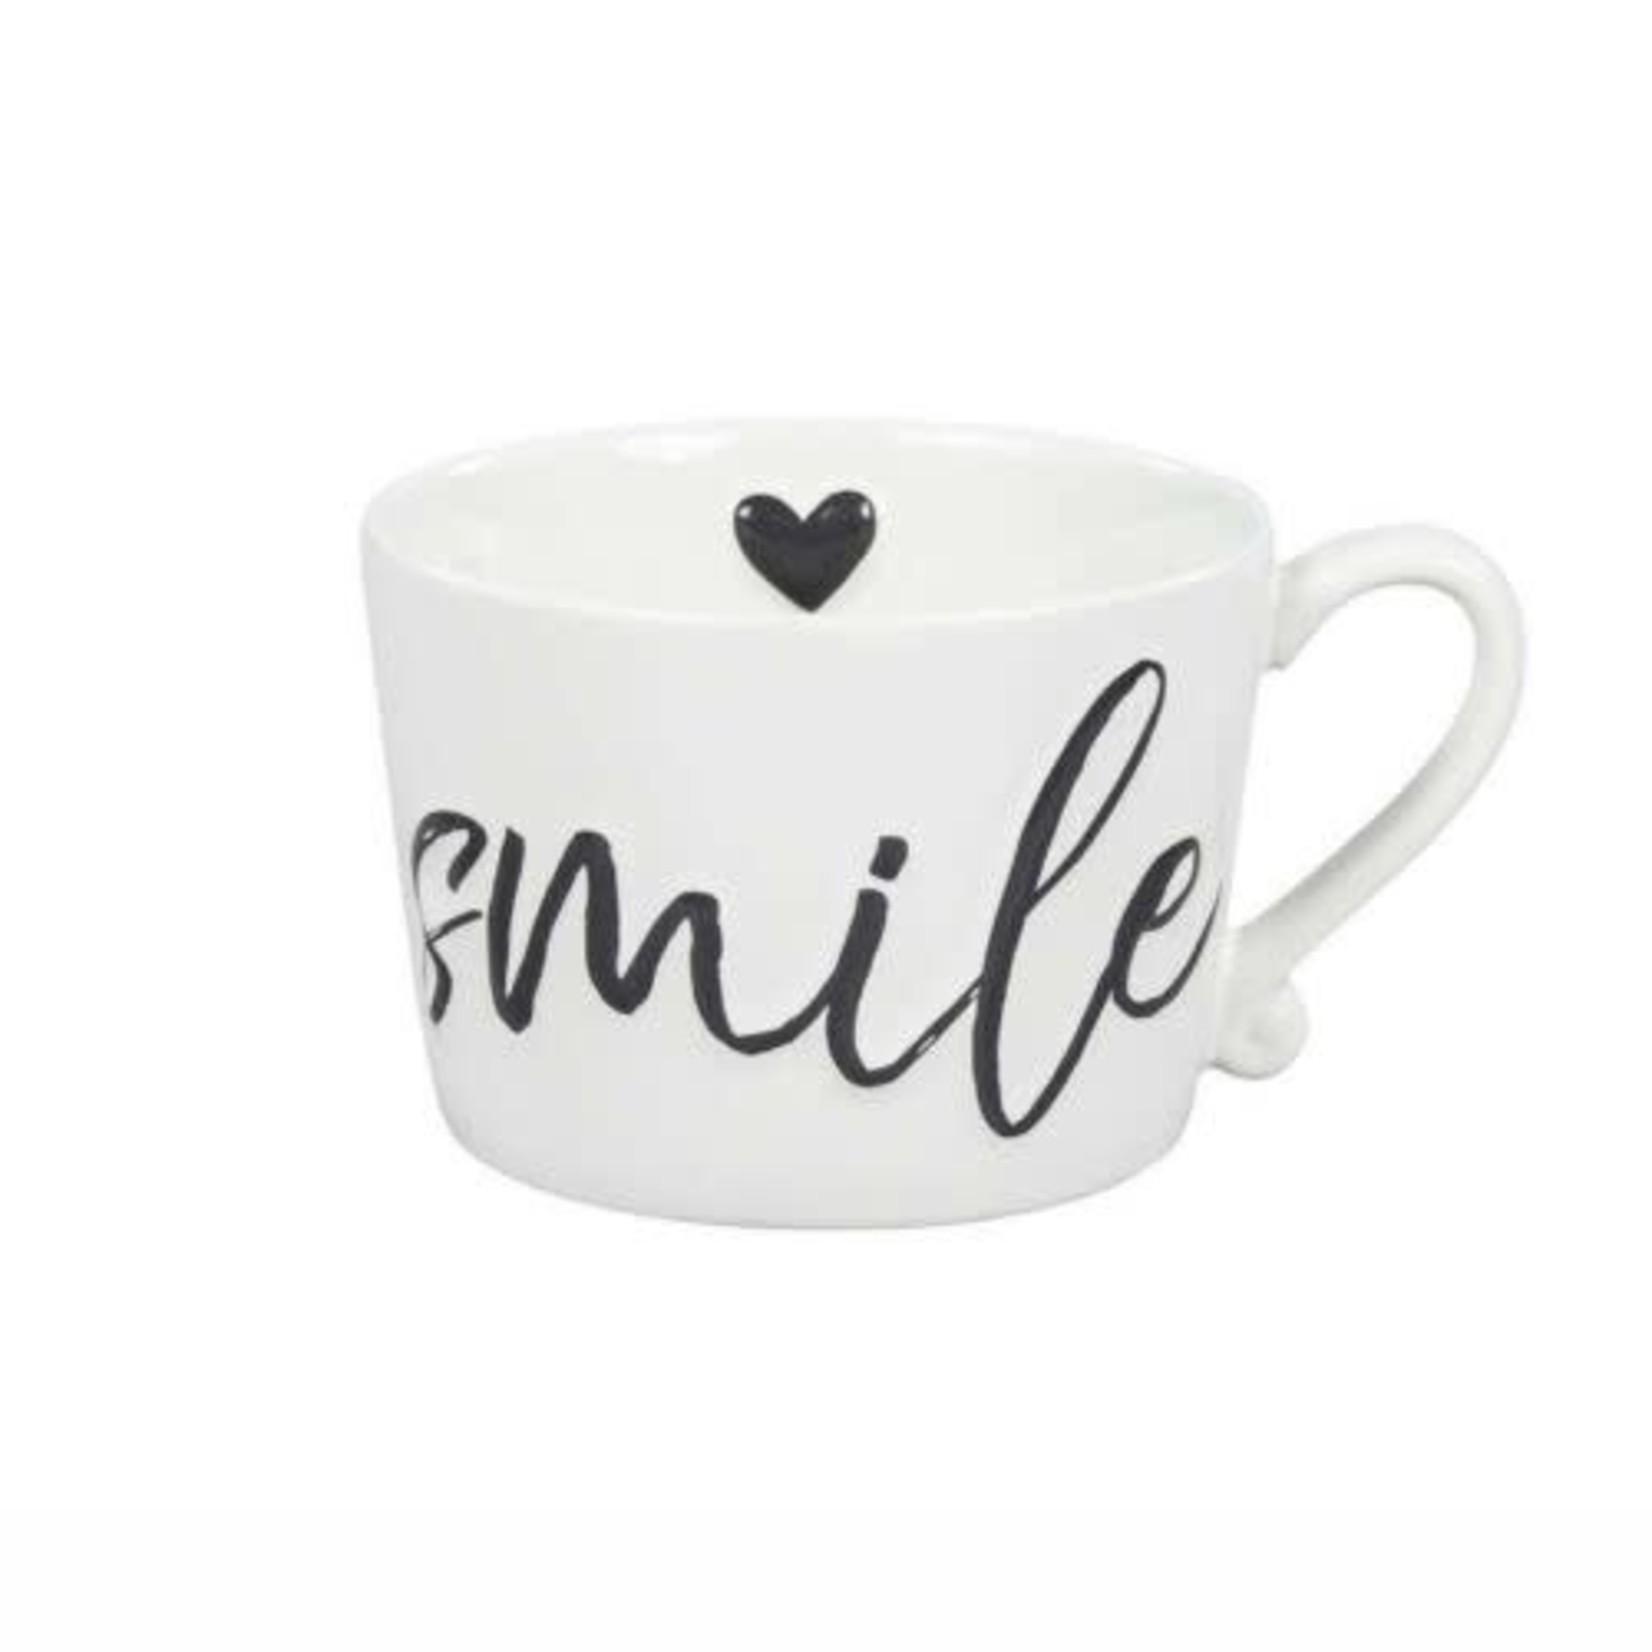 Bastion Collections Mug large White Smile in Black